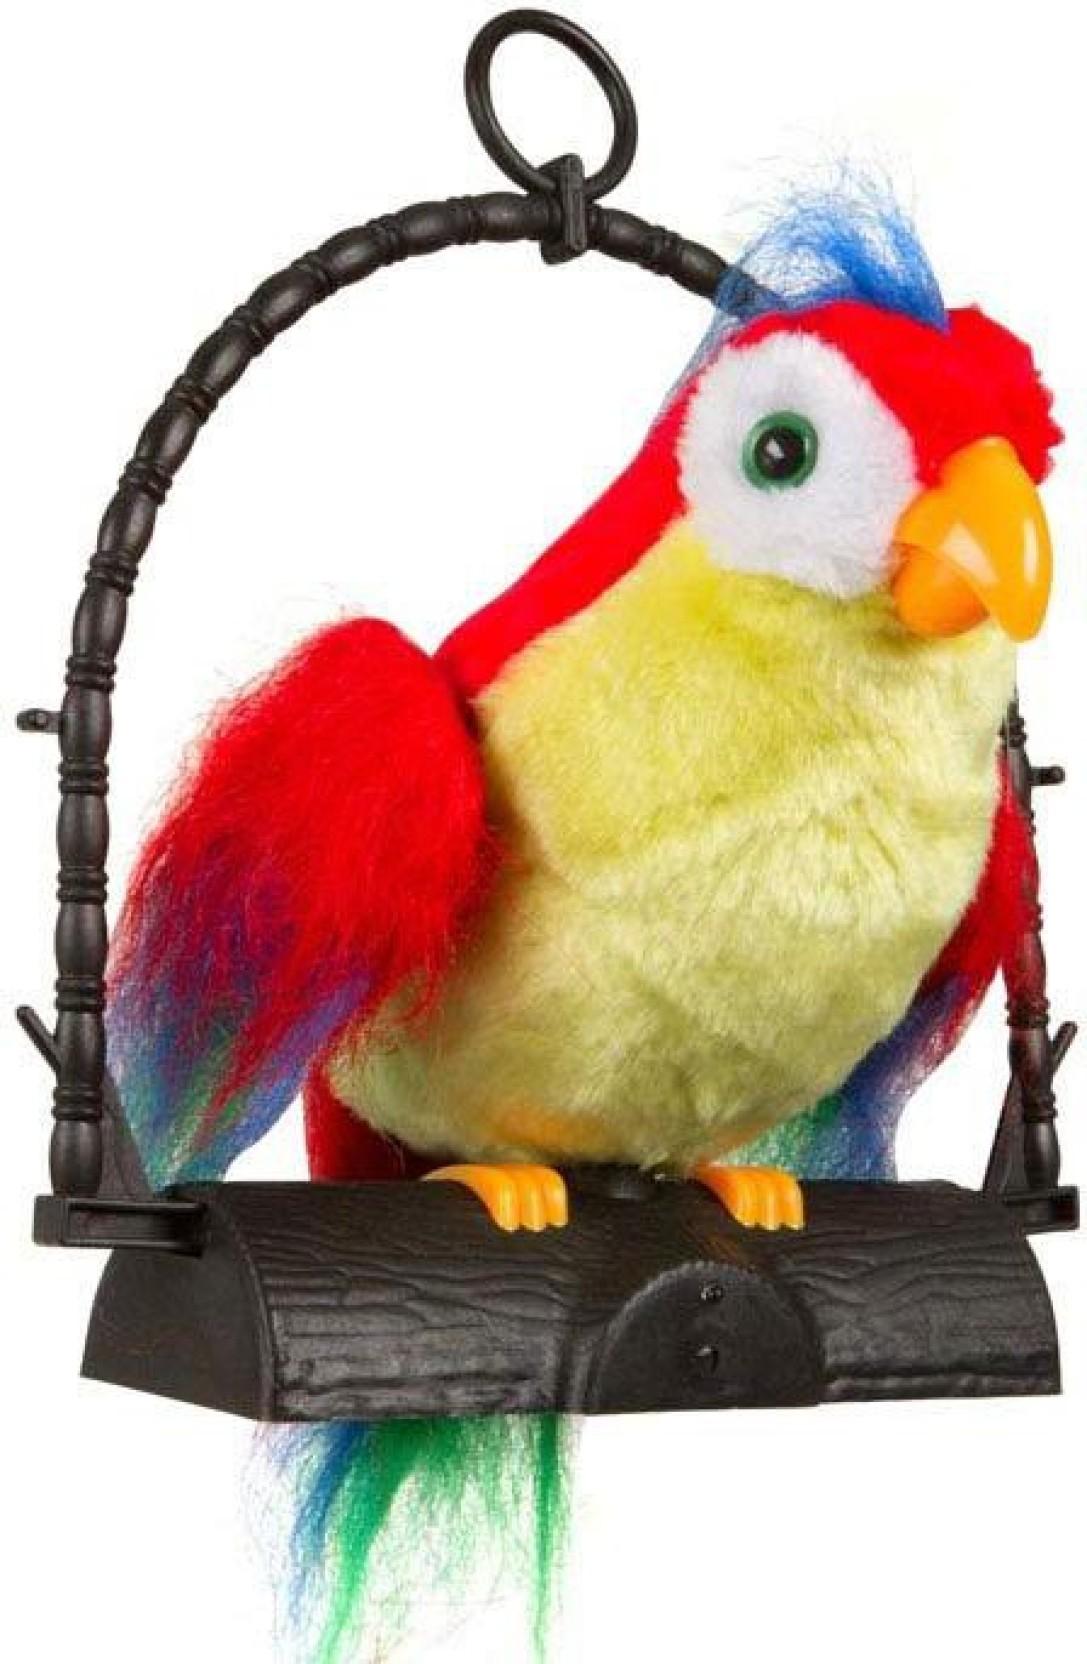 Bird Toy Outlet : Smartkshop talking parrot musical toy talk